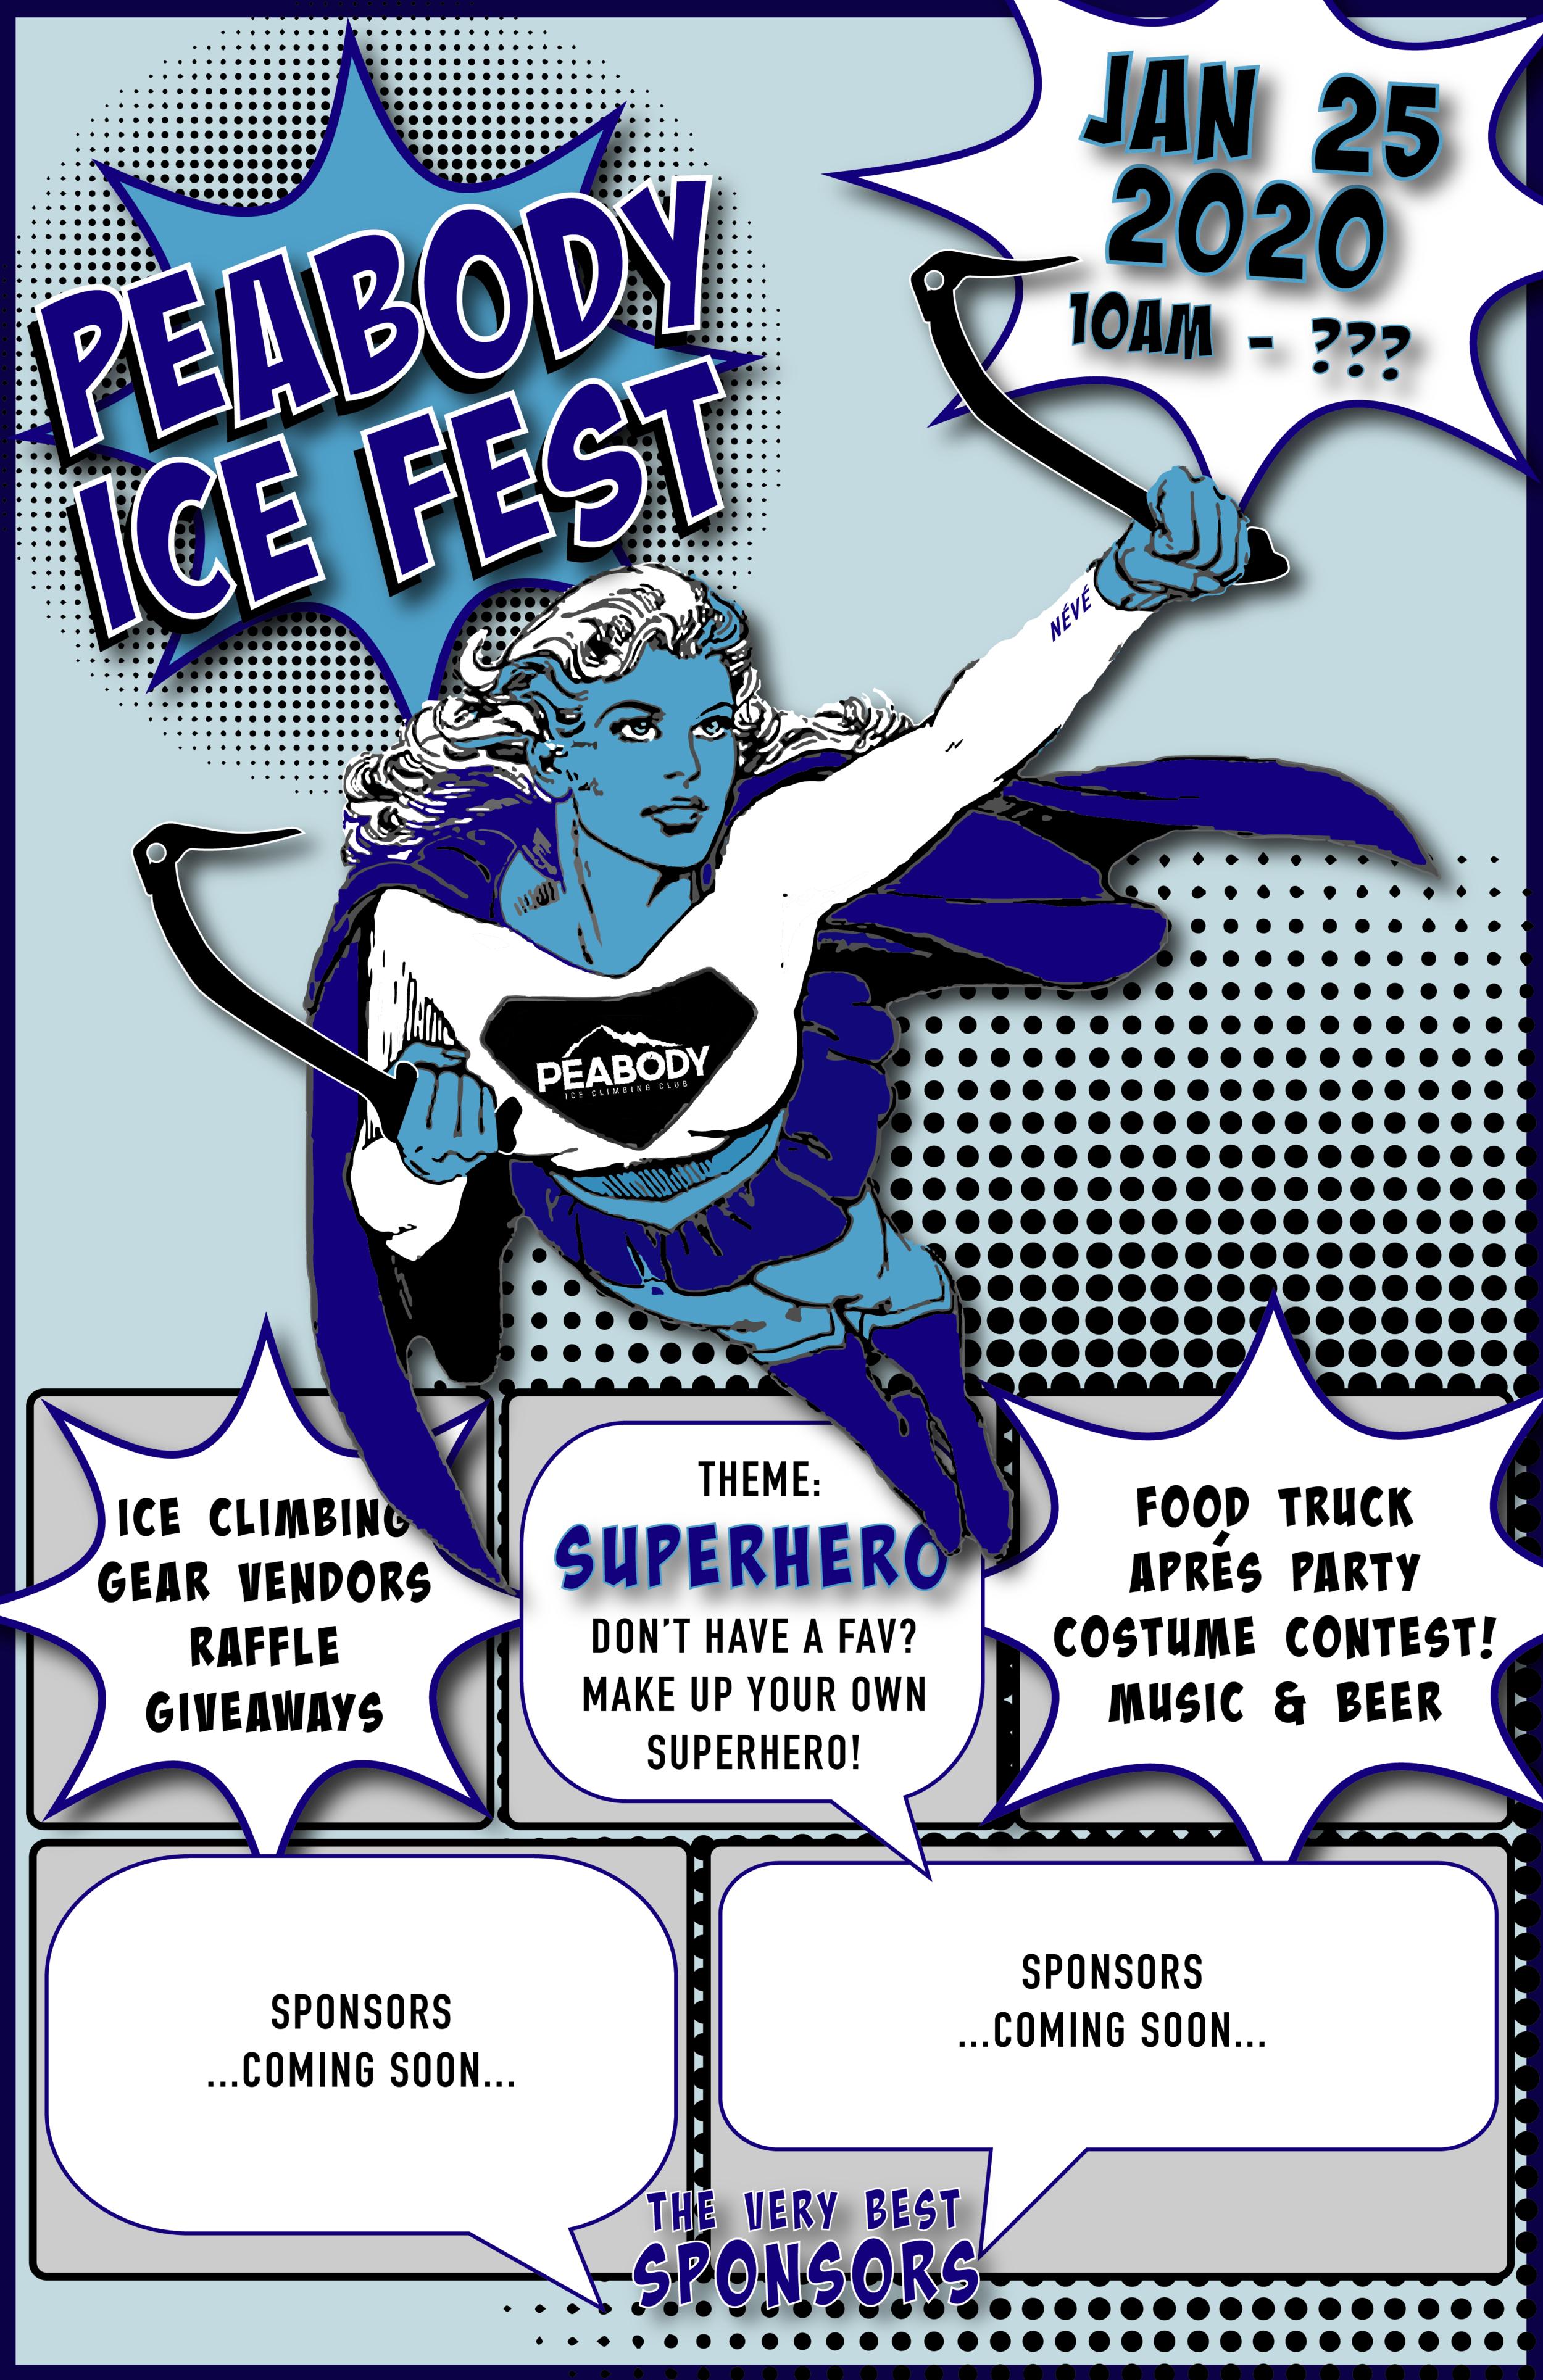 Peabody Ice Fest 2020